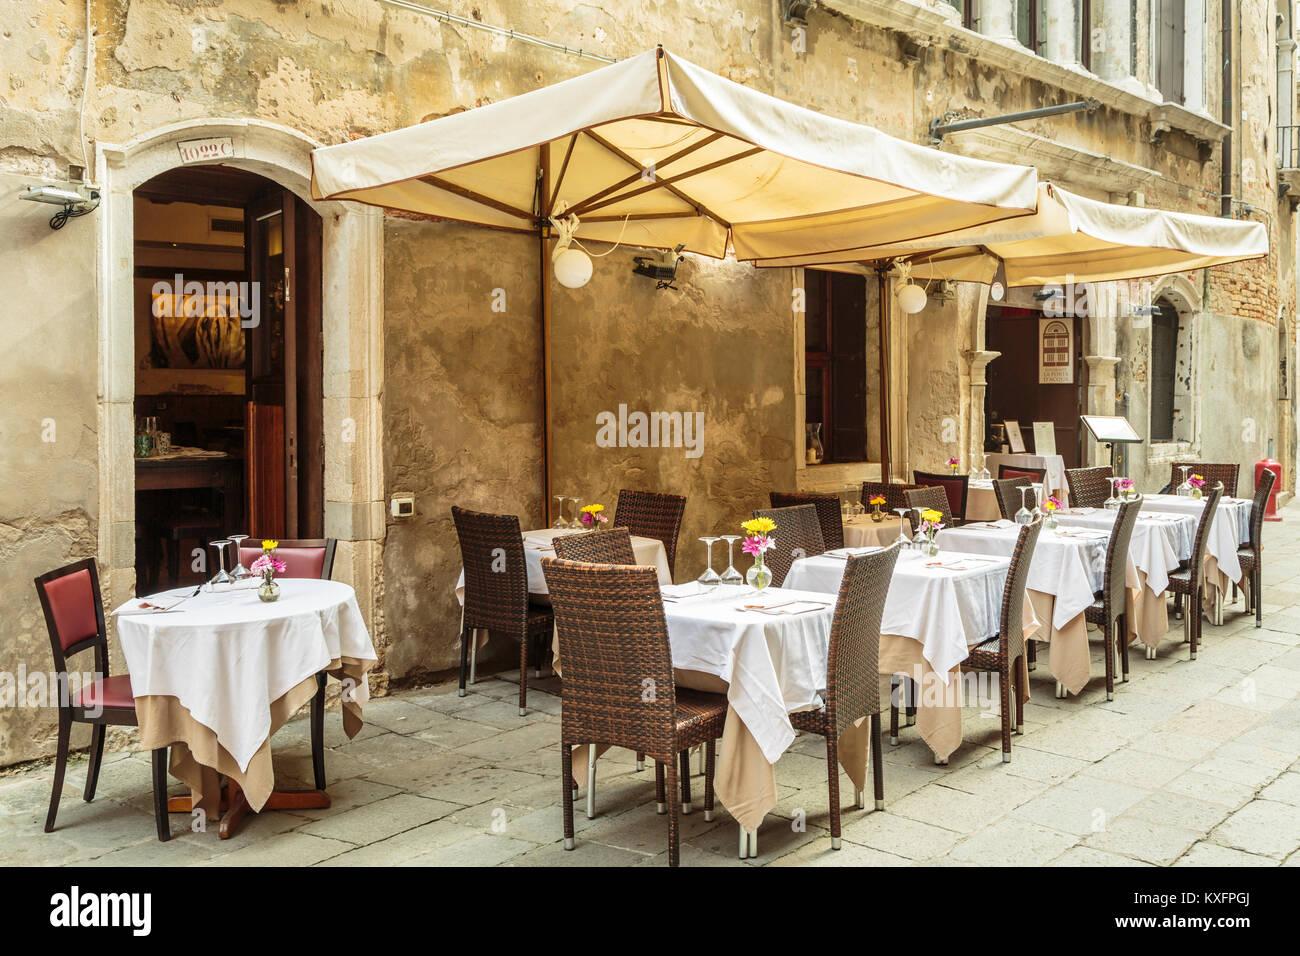 An outdoor restaurant in Veneto, Venice, Italy, Europe. - Stock Image